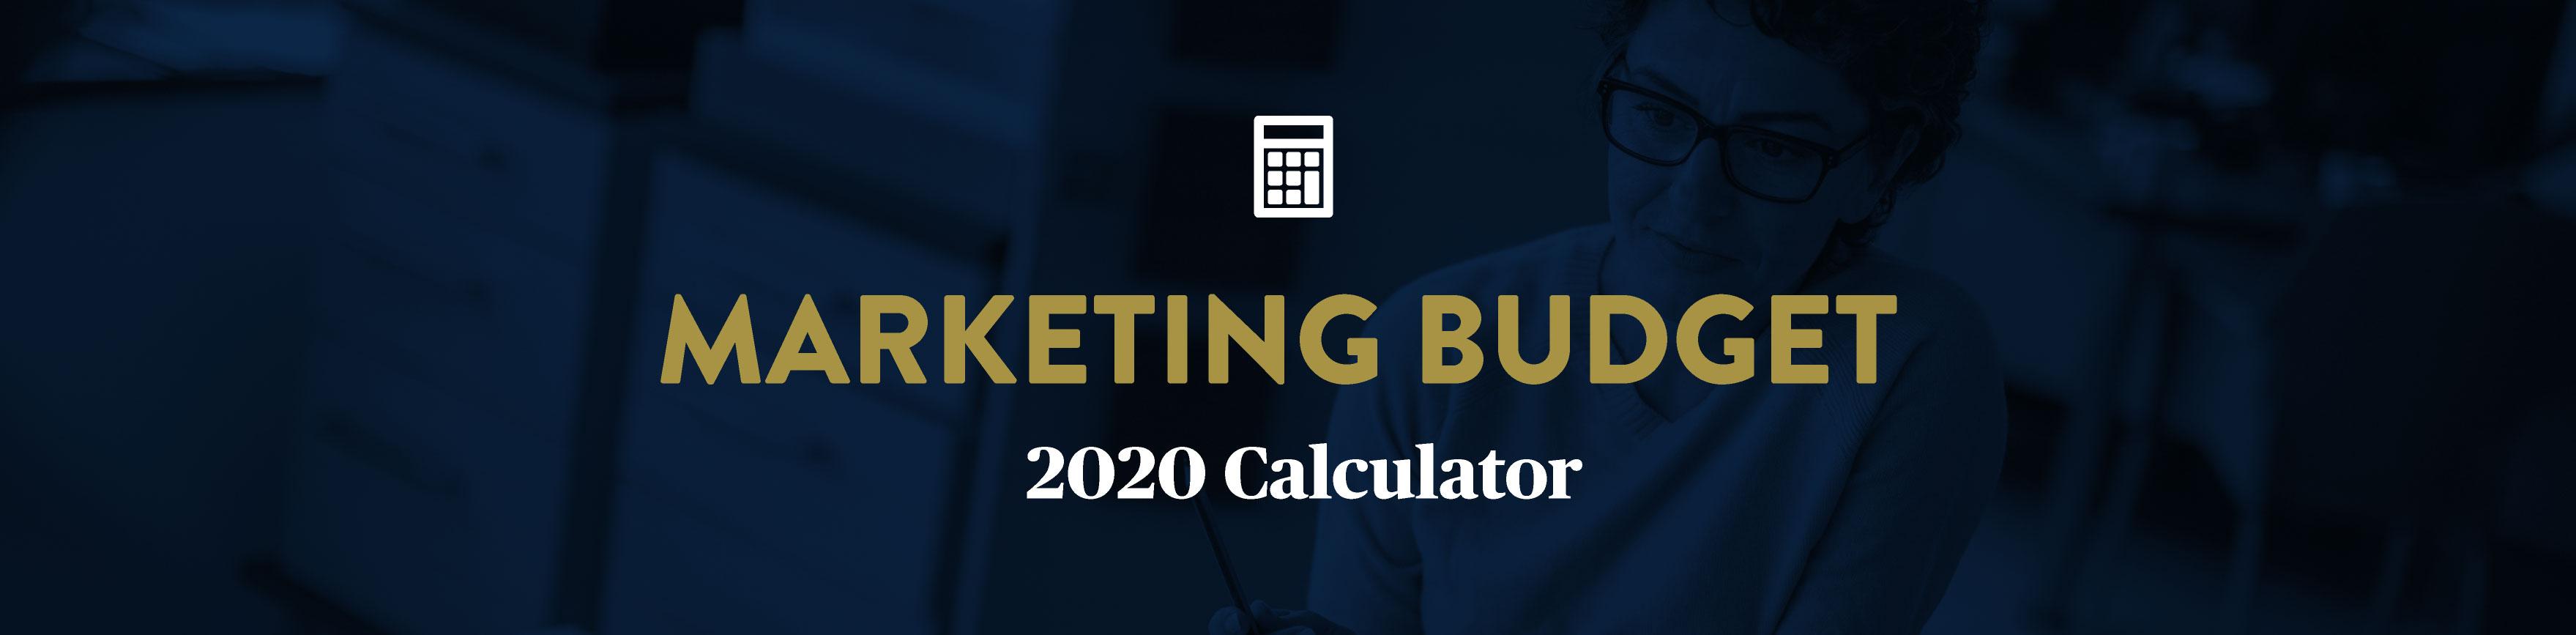 Marketing Budget Calculator 2020